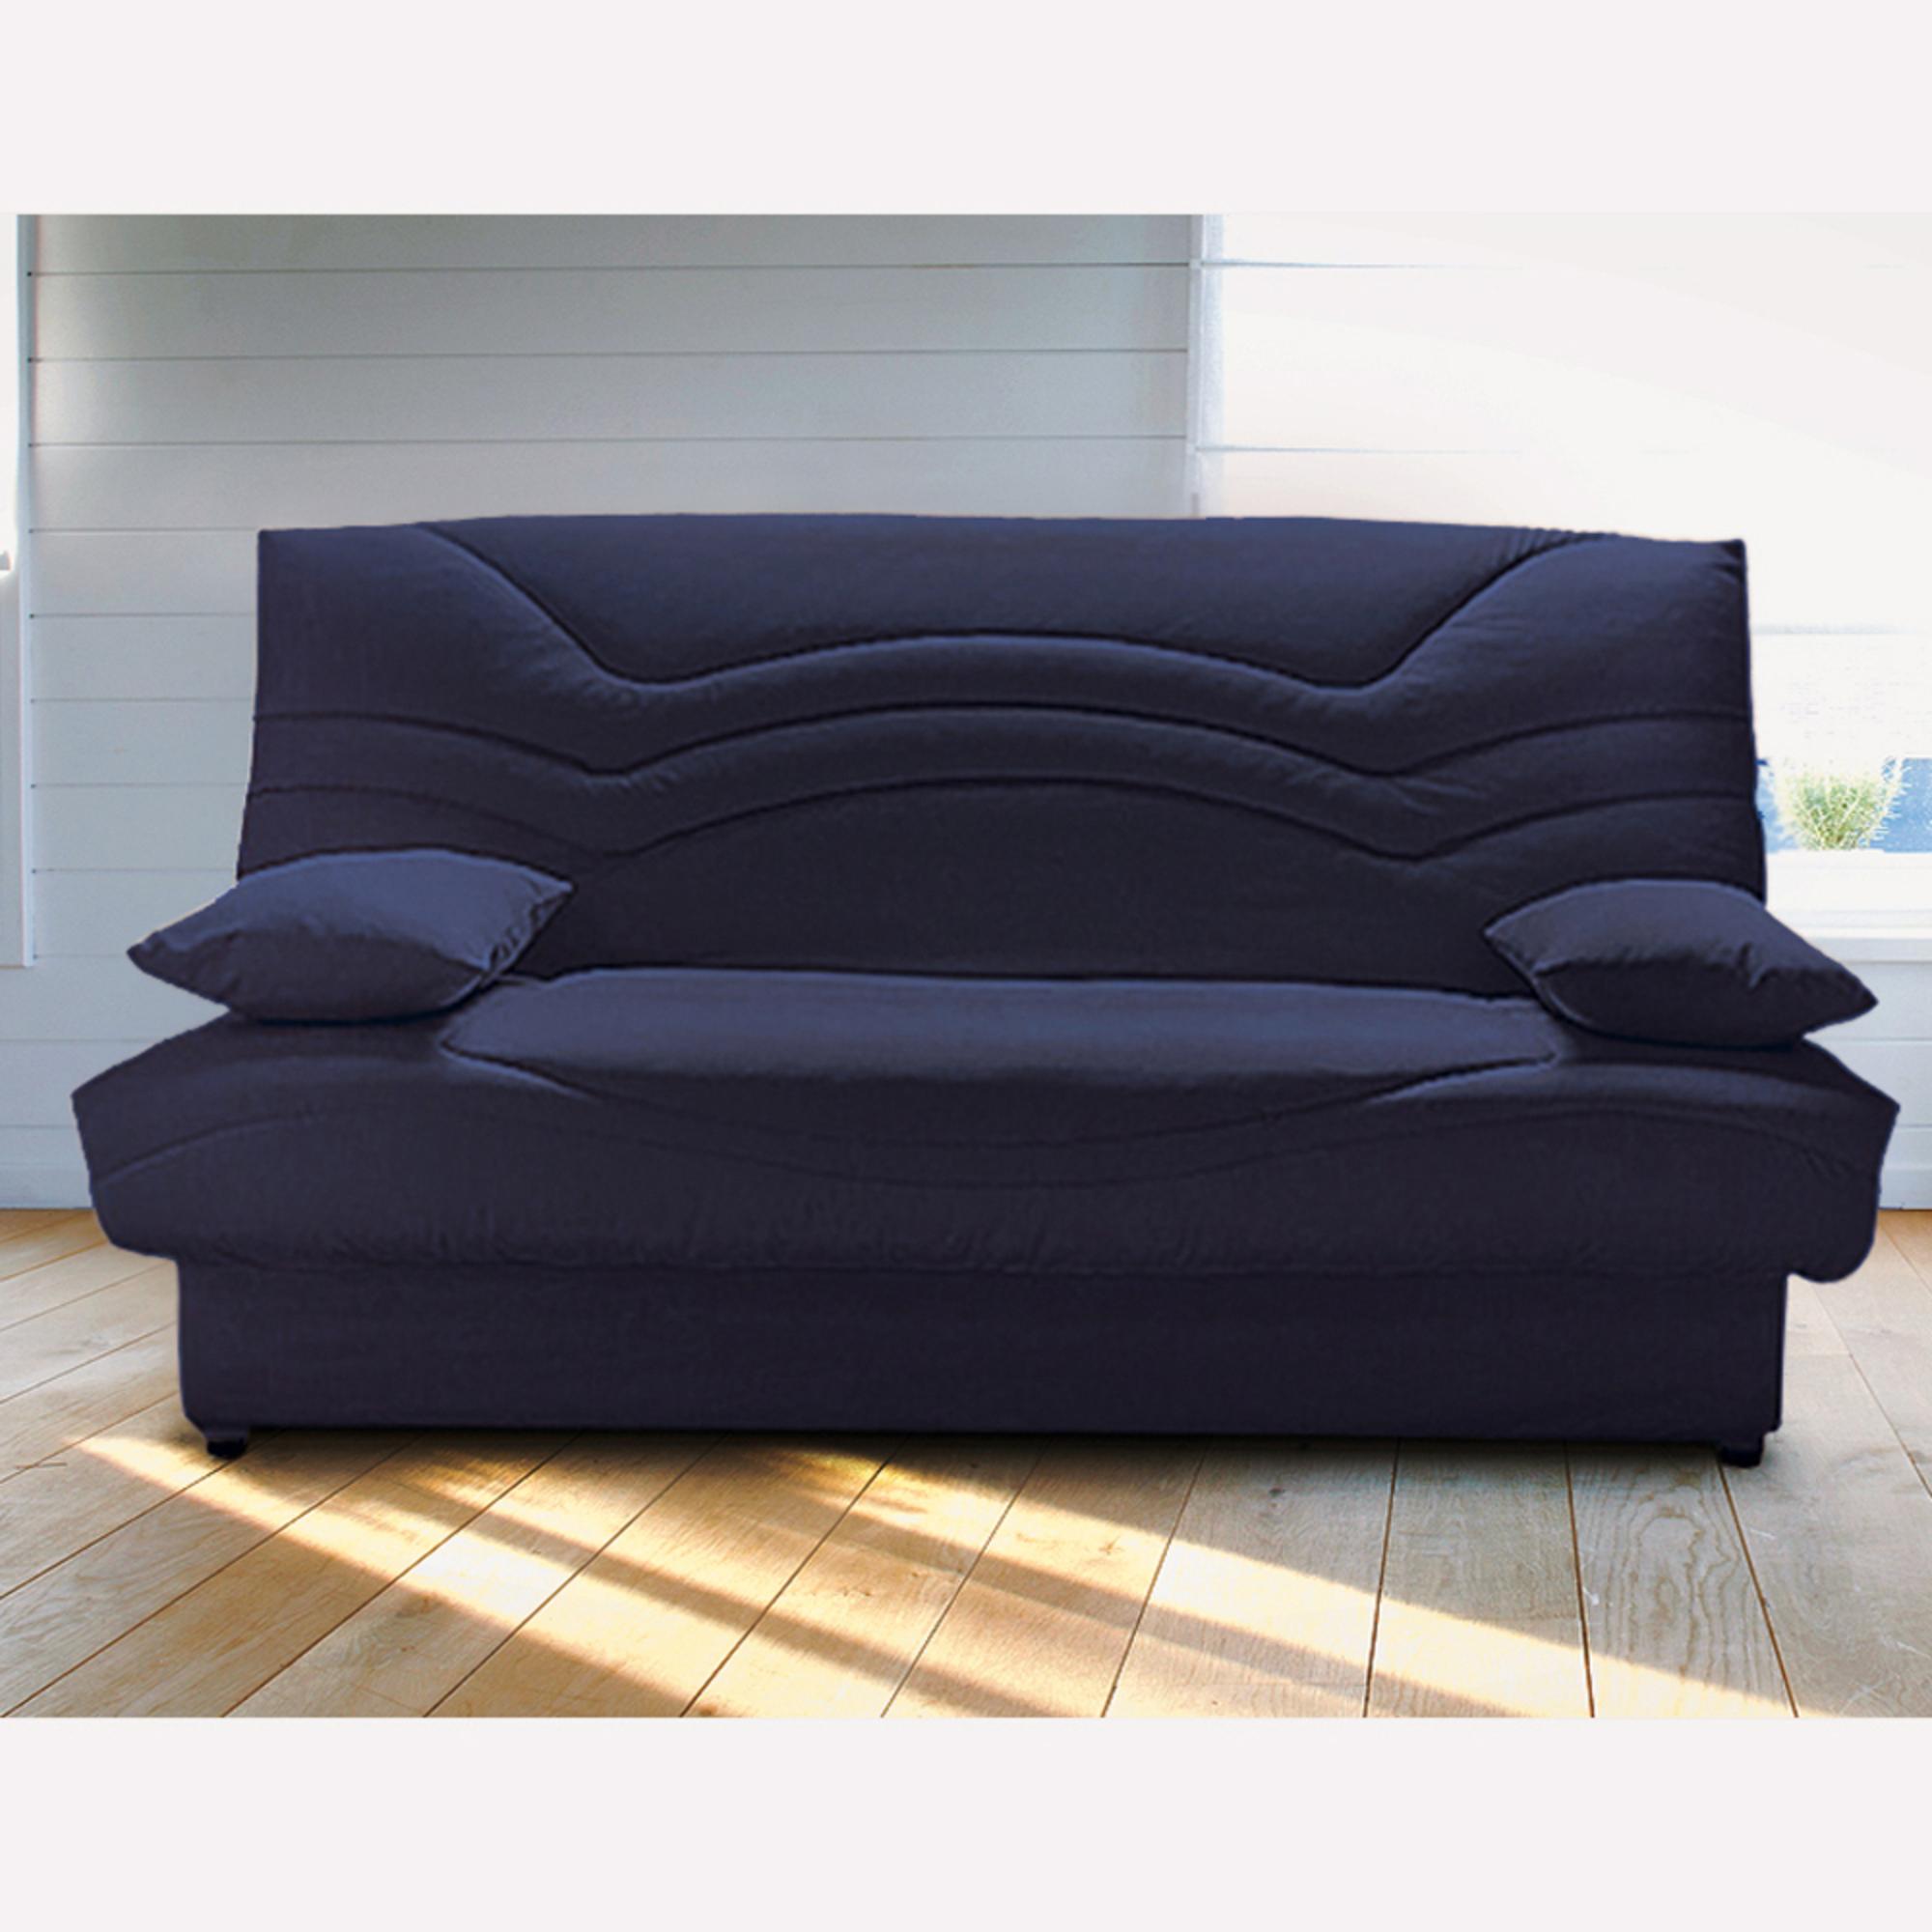 Canapé clic clac 130 cm